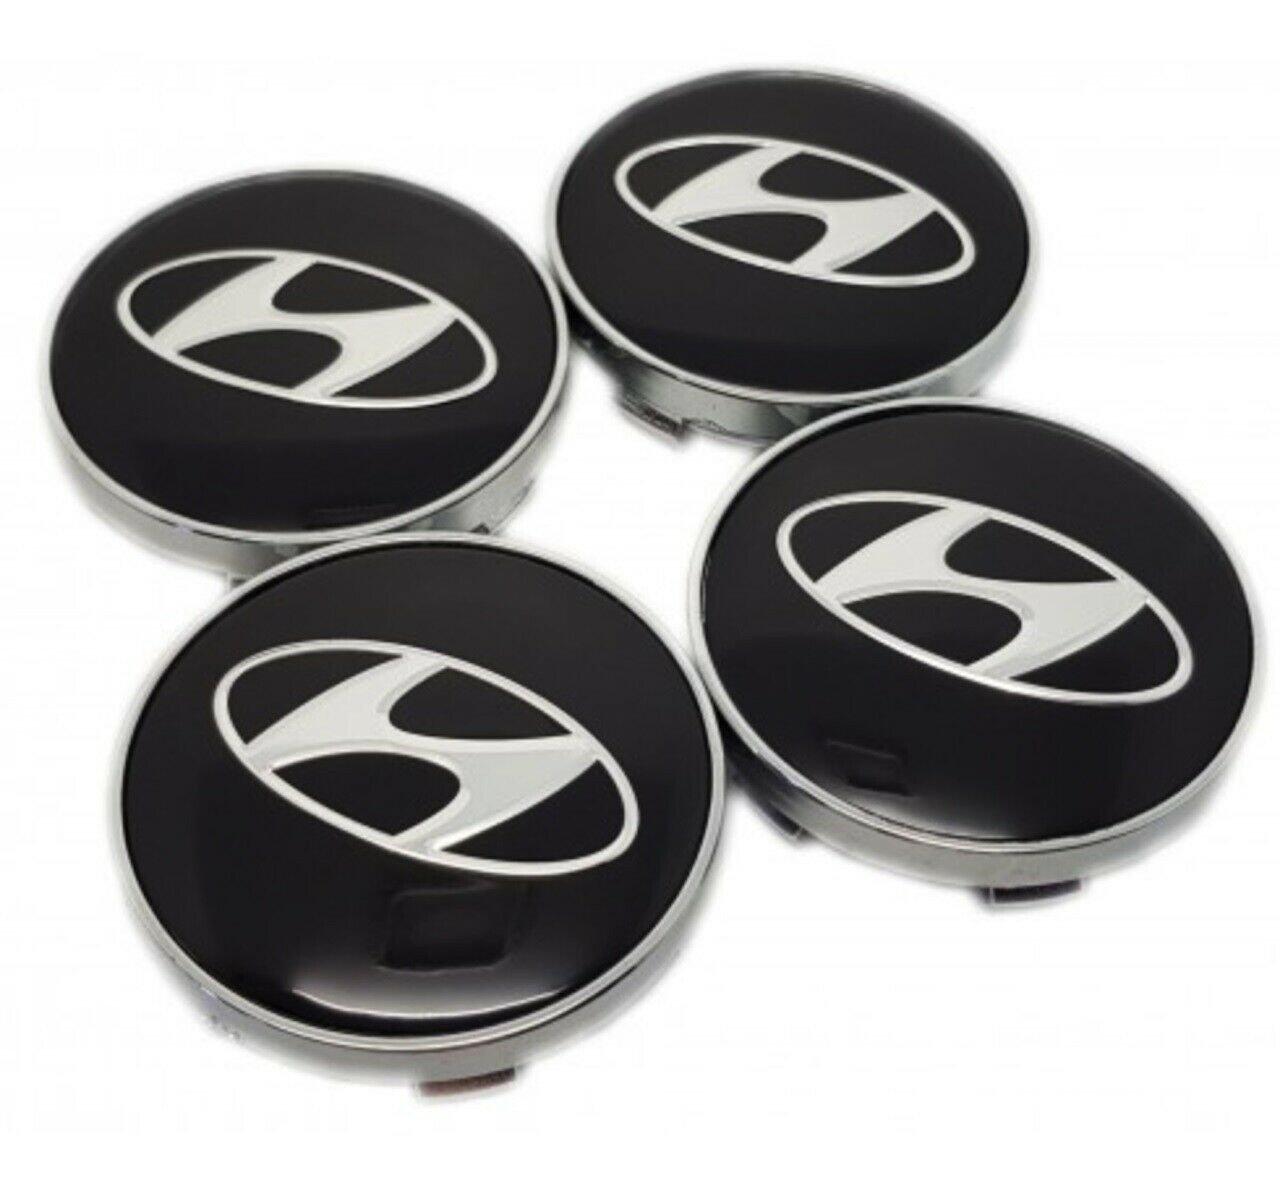 60mm Hyundai Black Silver Hubcap Cover Wheel Center Cap Set